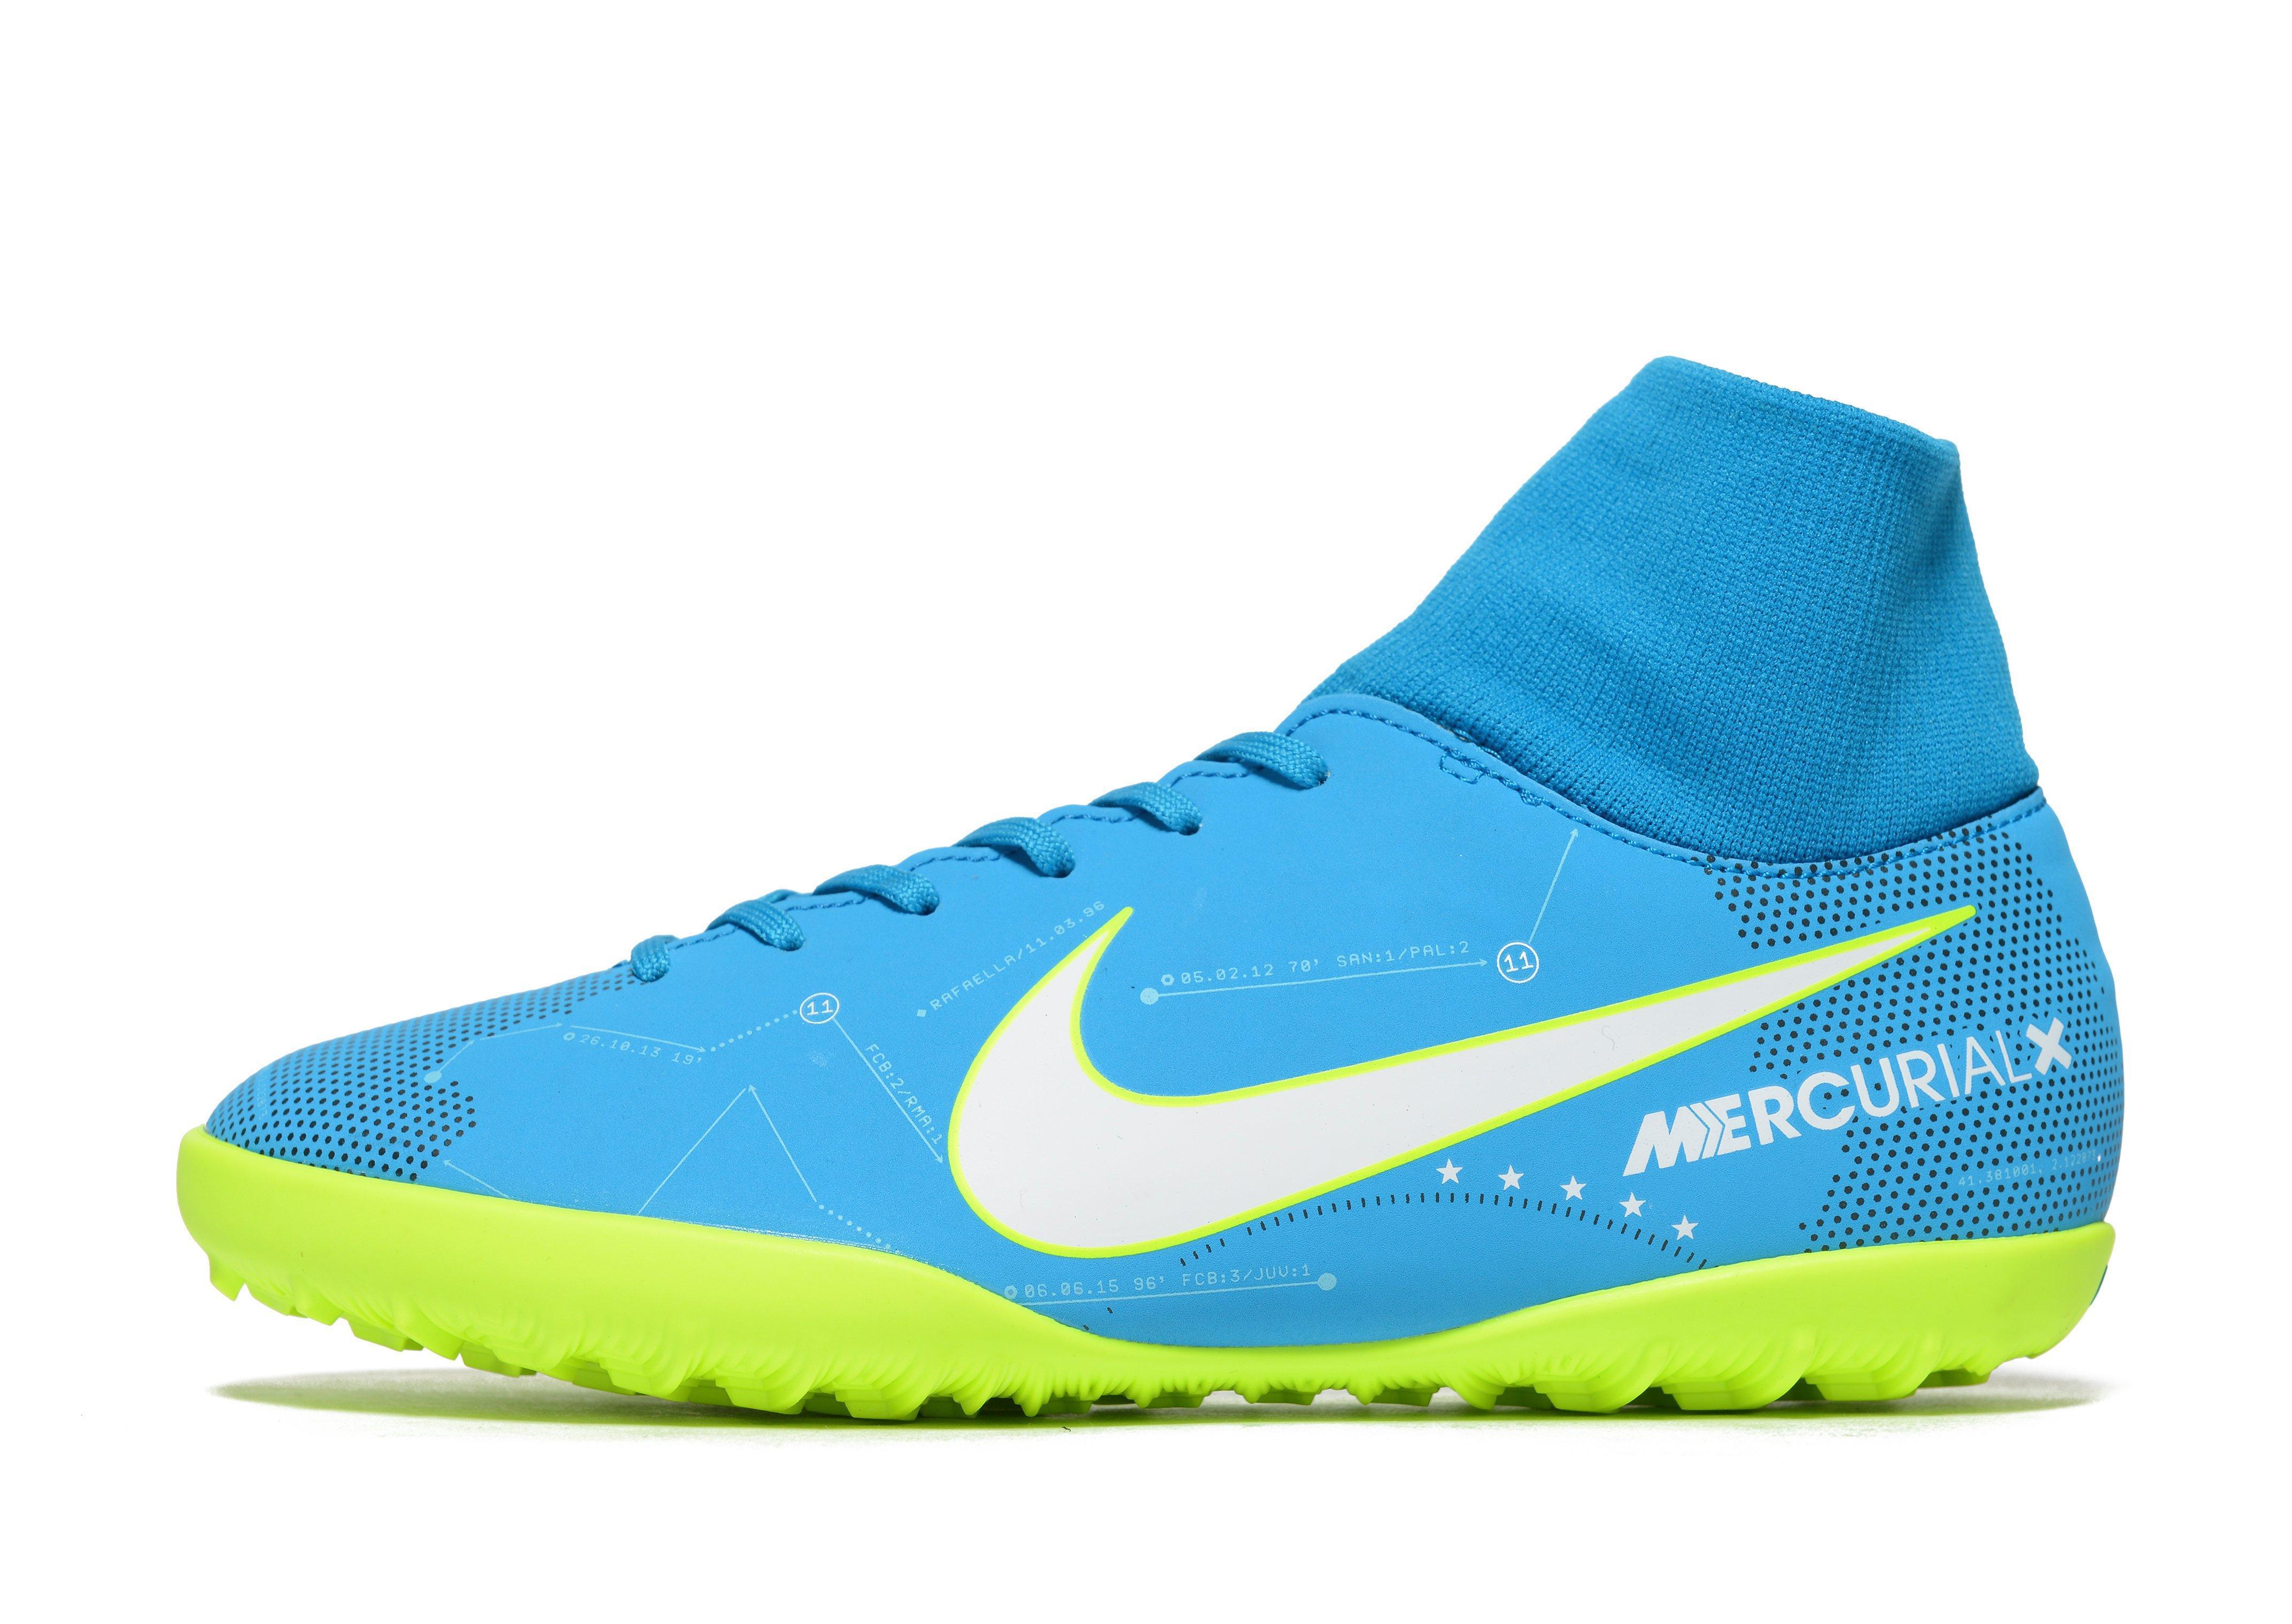 official photos 9ed03 ab0e1 Nike Motion Blur Mercurial Vortex Turf Junior in Blue for Me